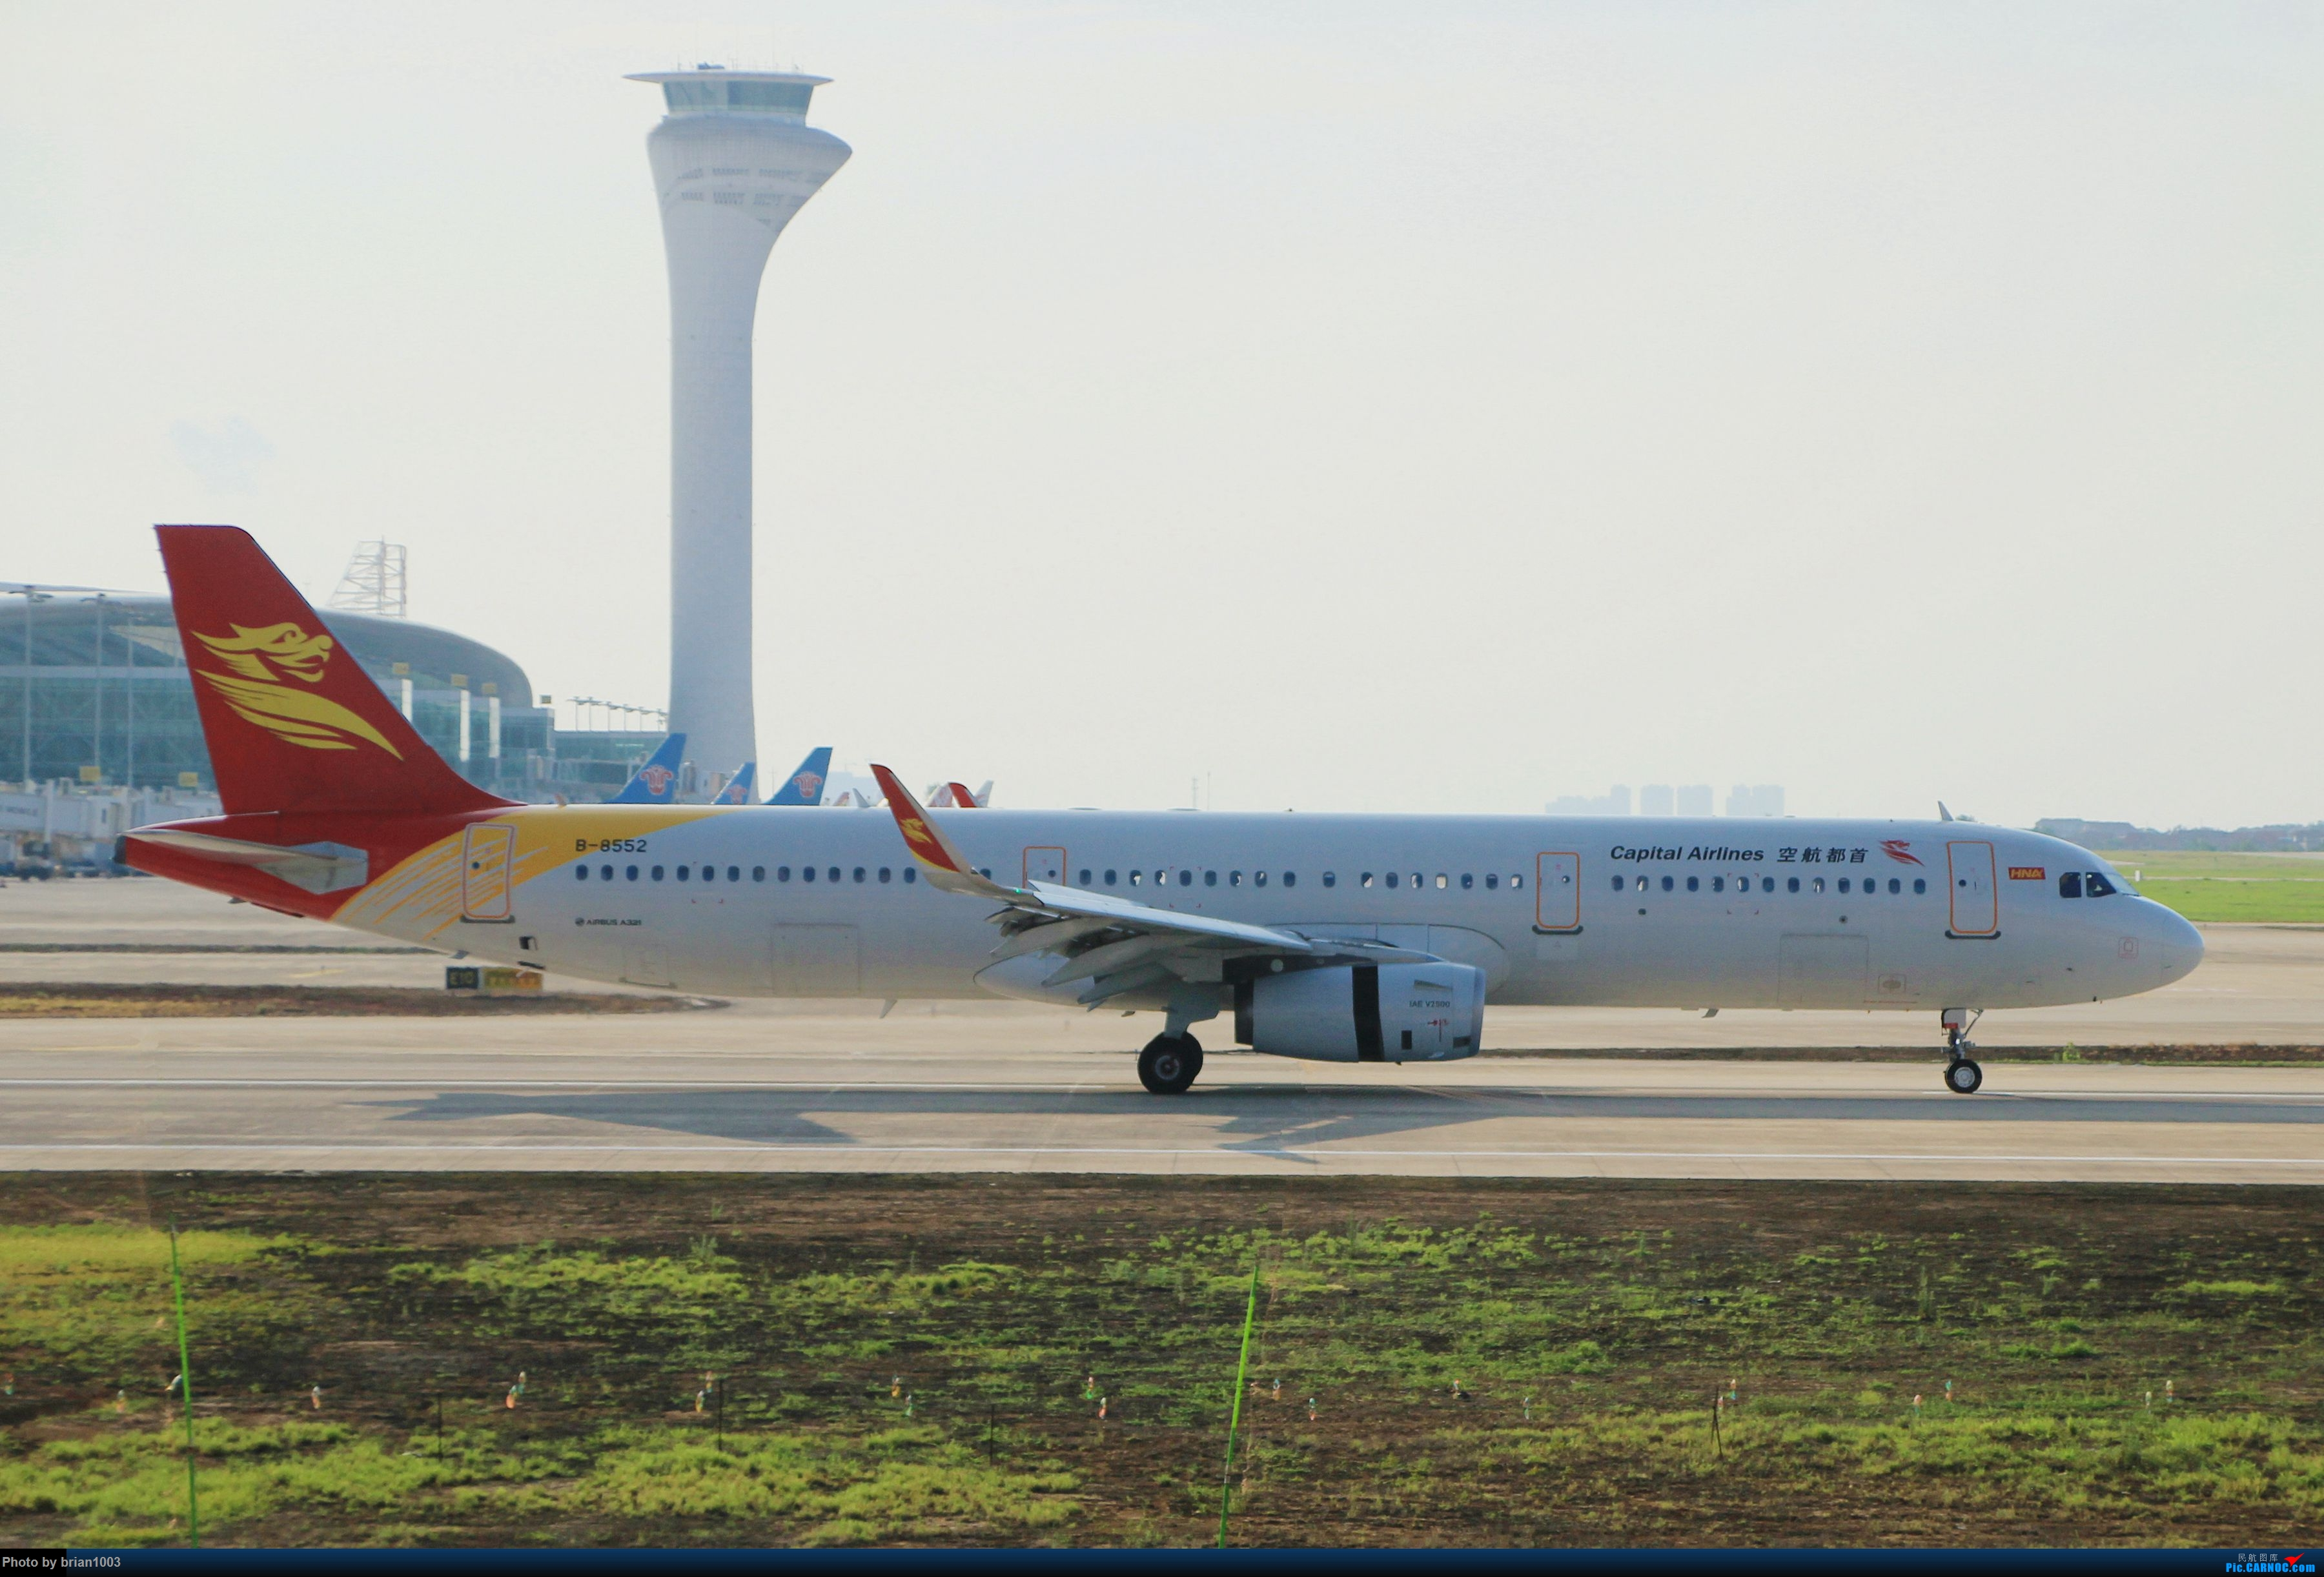 Re:[原创]WUH武汉天河机场拍机之喜迎纽约直飞 AIRBUS A321-200 B-8552 中国武汉天河国际机场